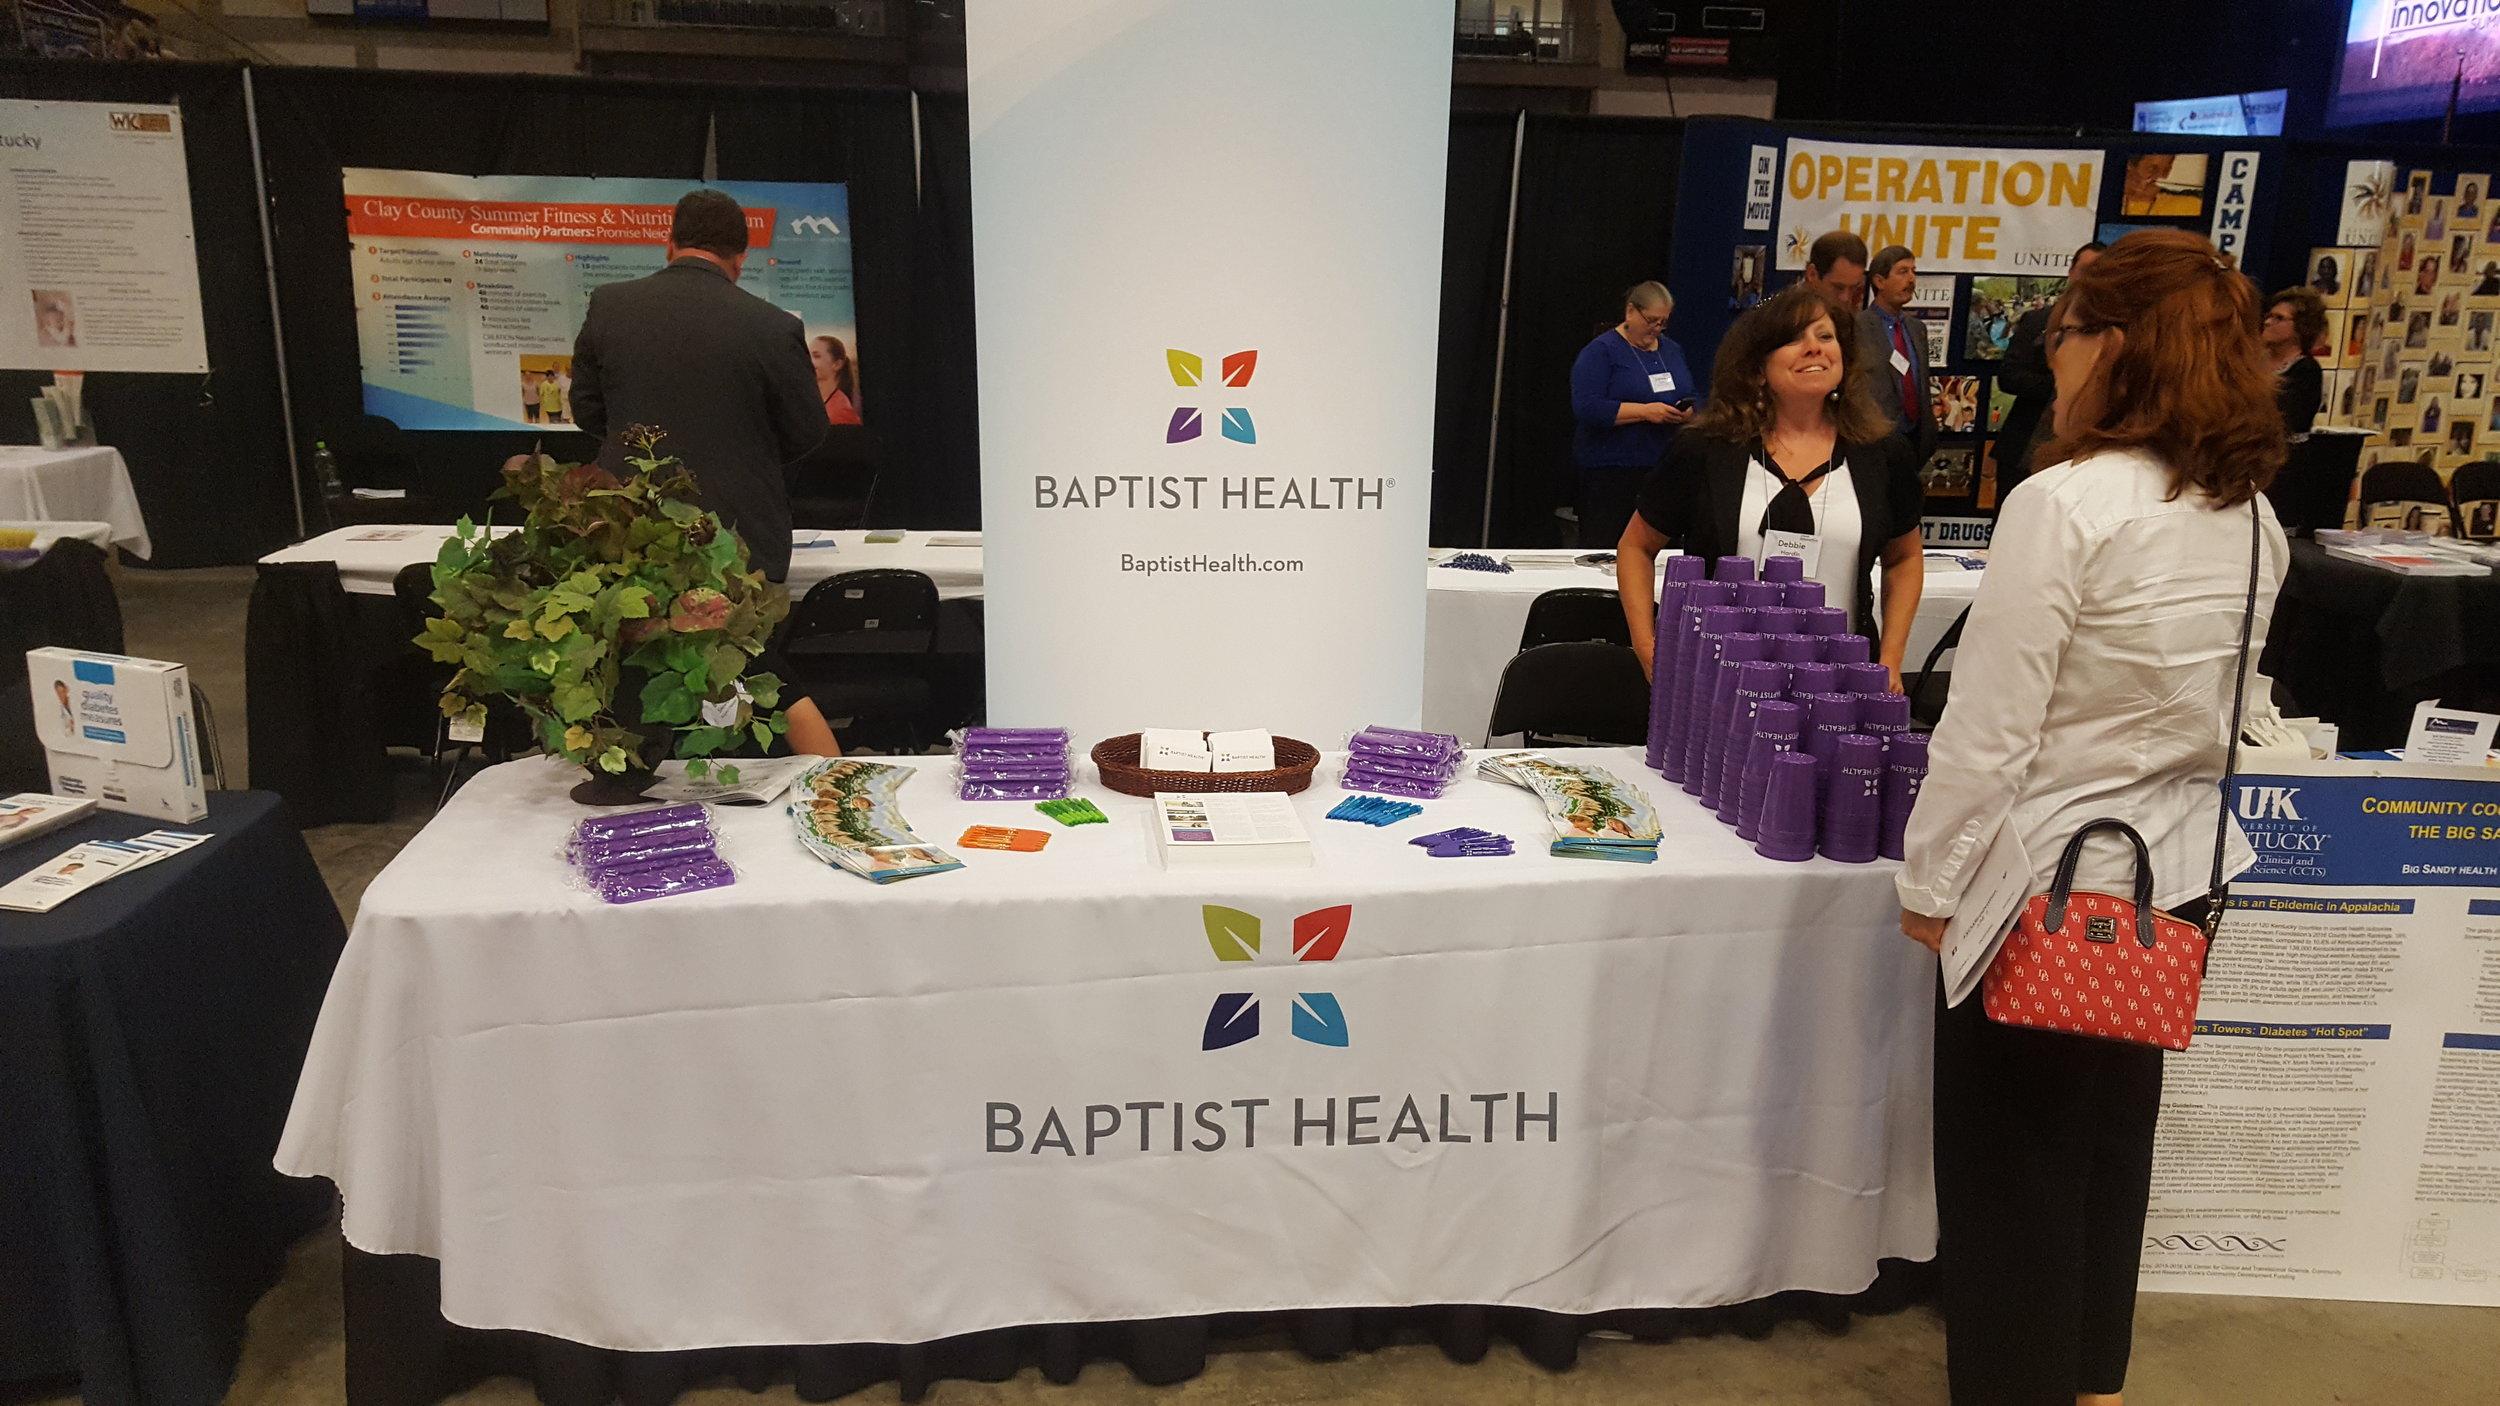 Baptist Health 2.jpg